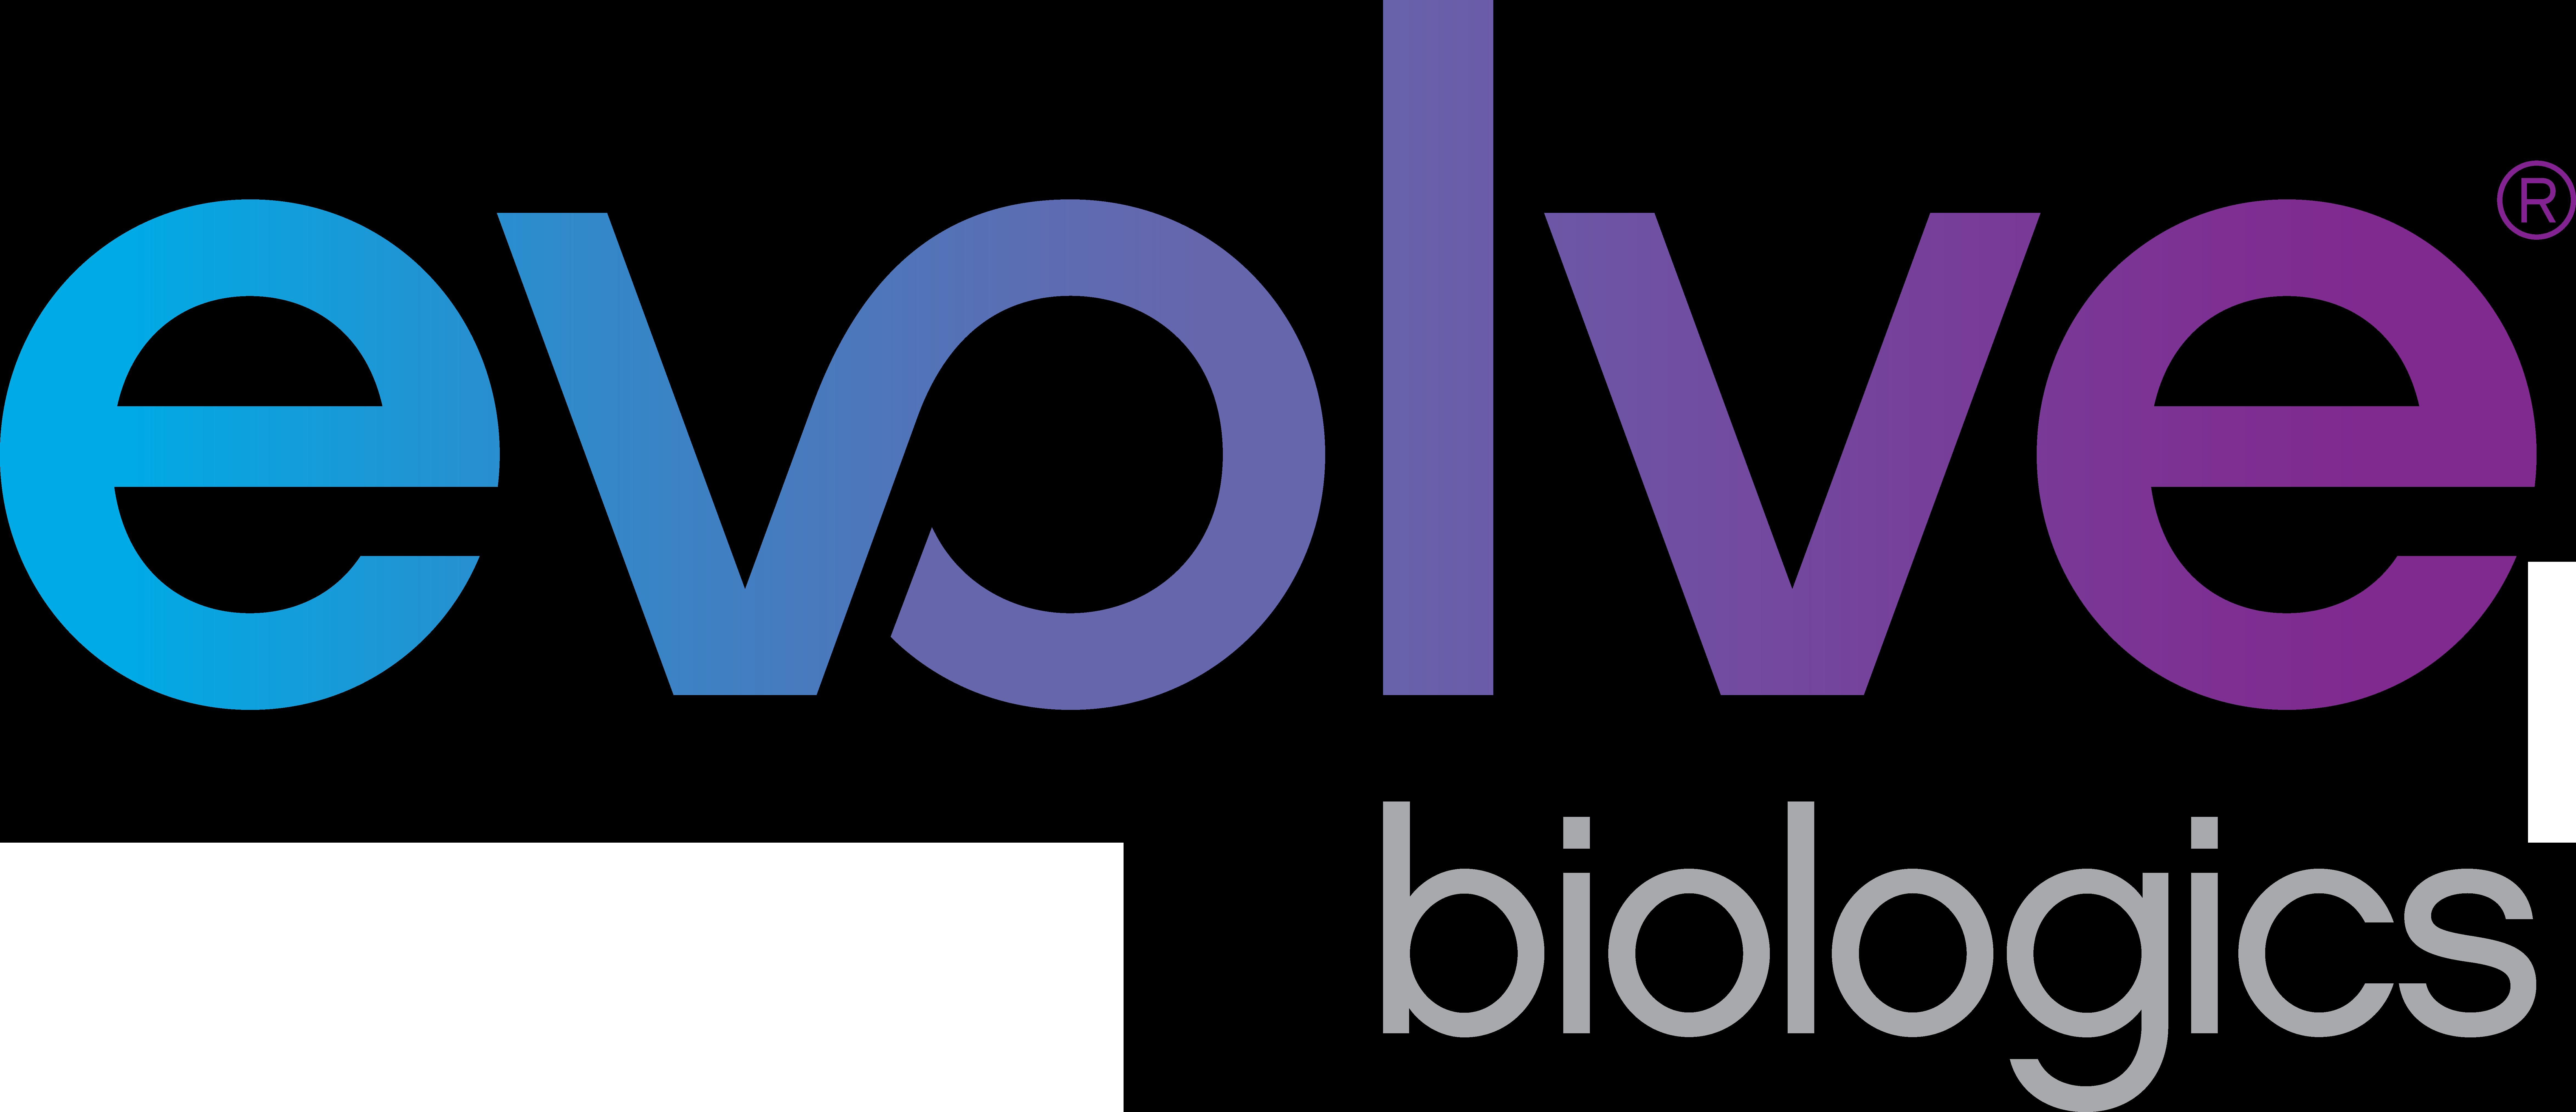 Evolve Biologics